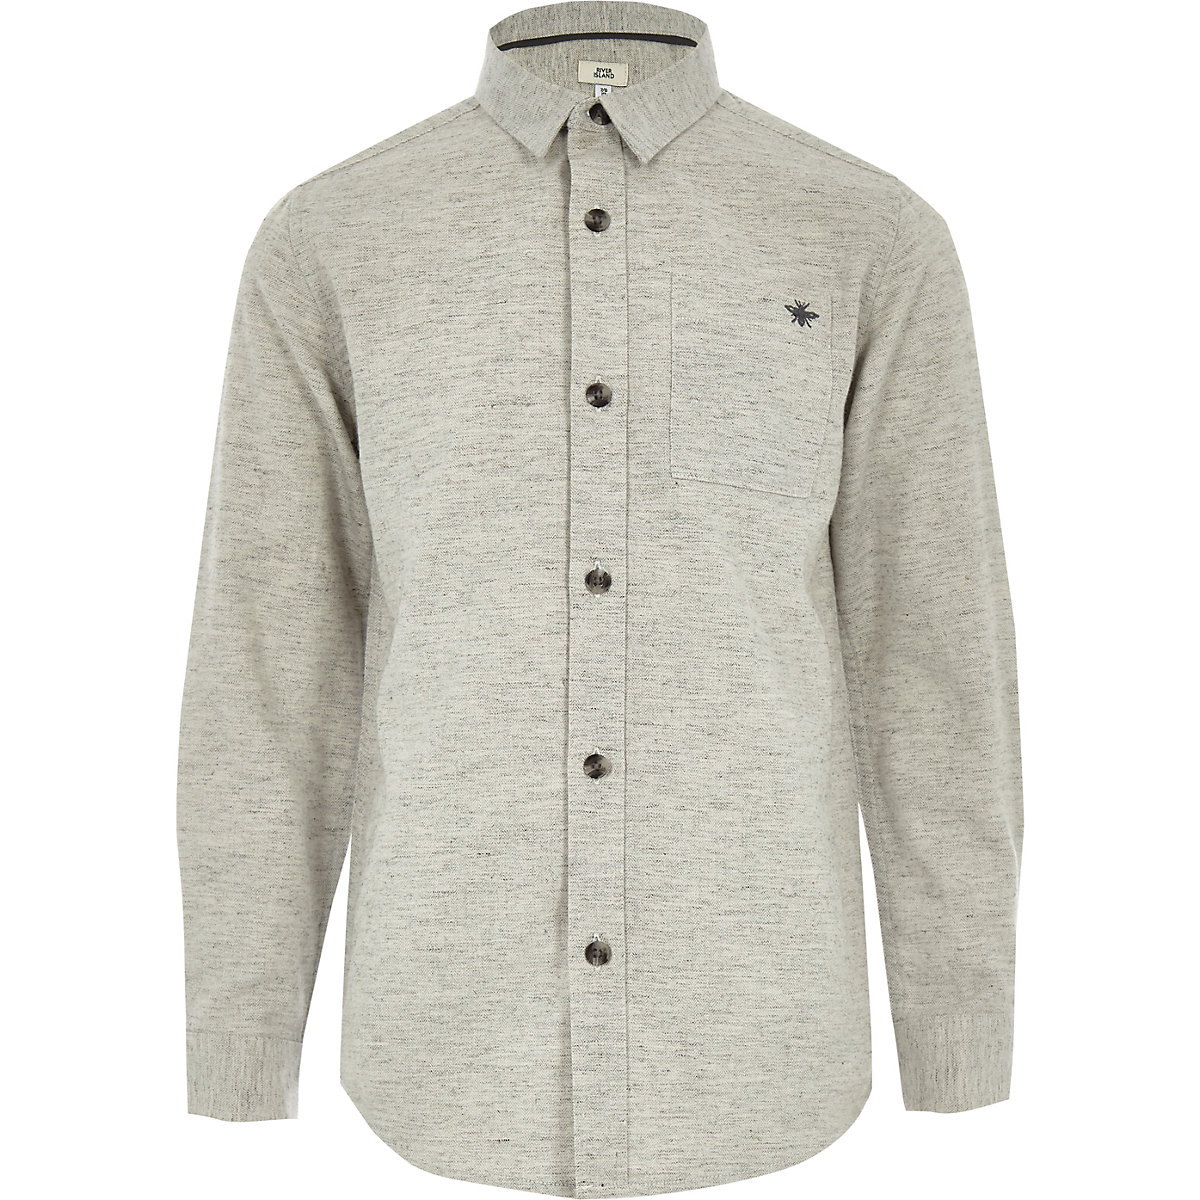 Boys grey long sleeve herringbone shirt